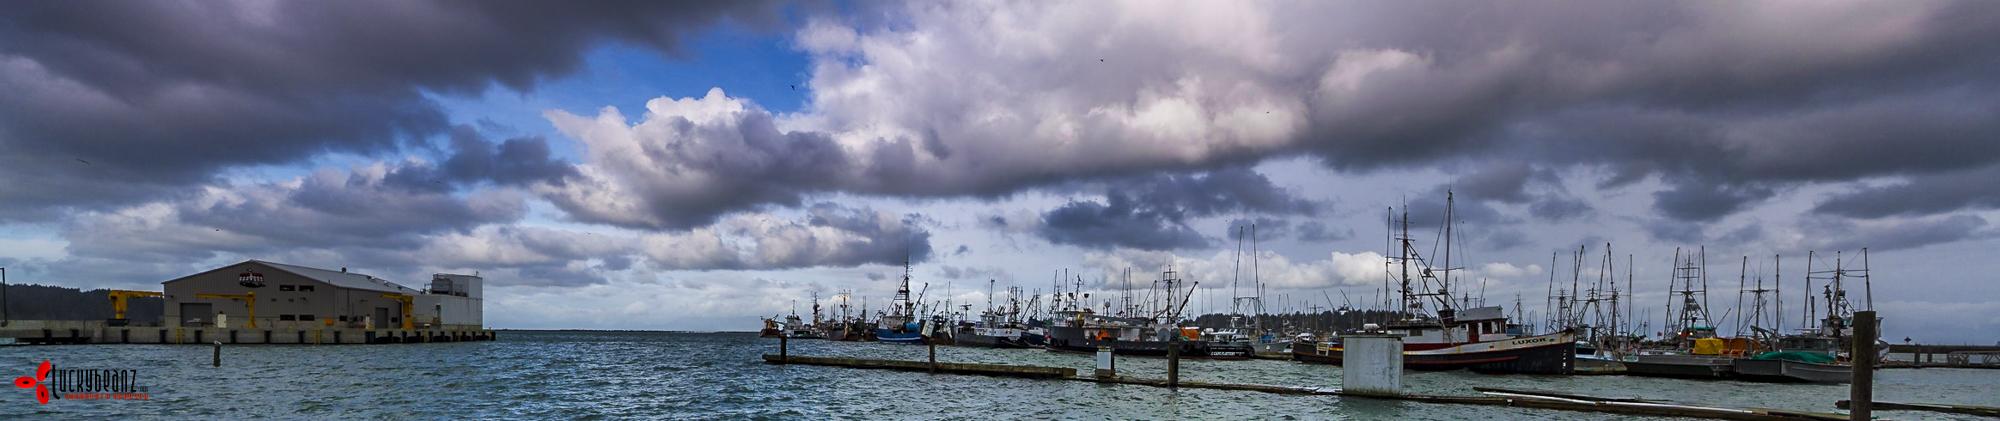 A rare rain free moment in Neigh Bay.